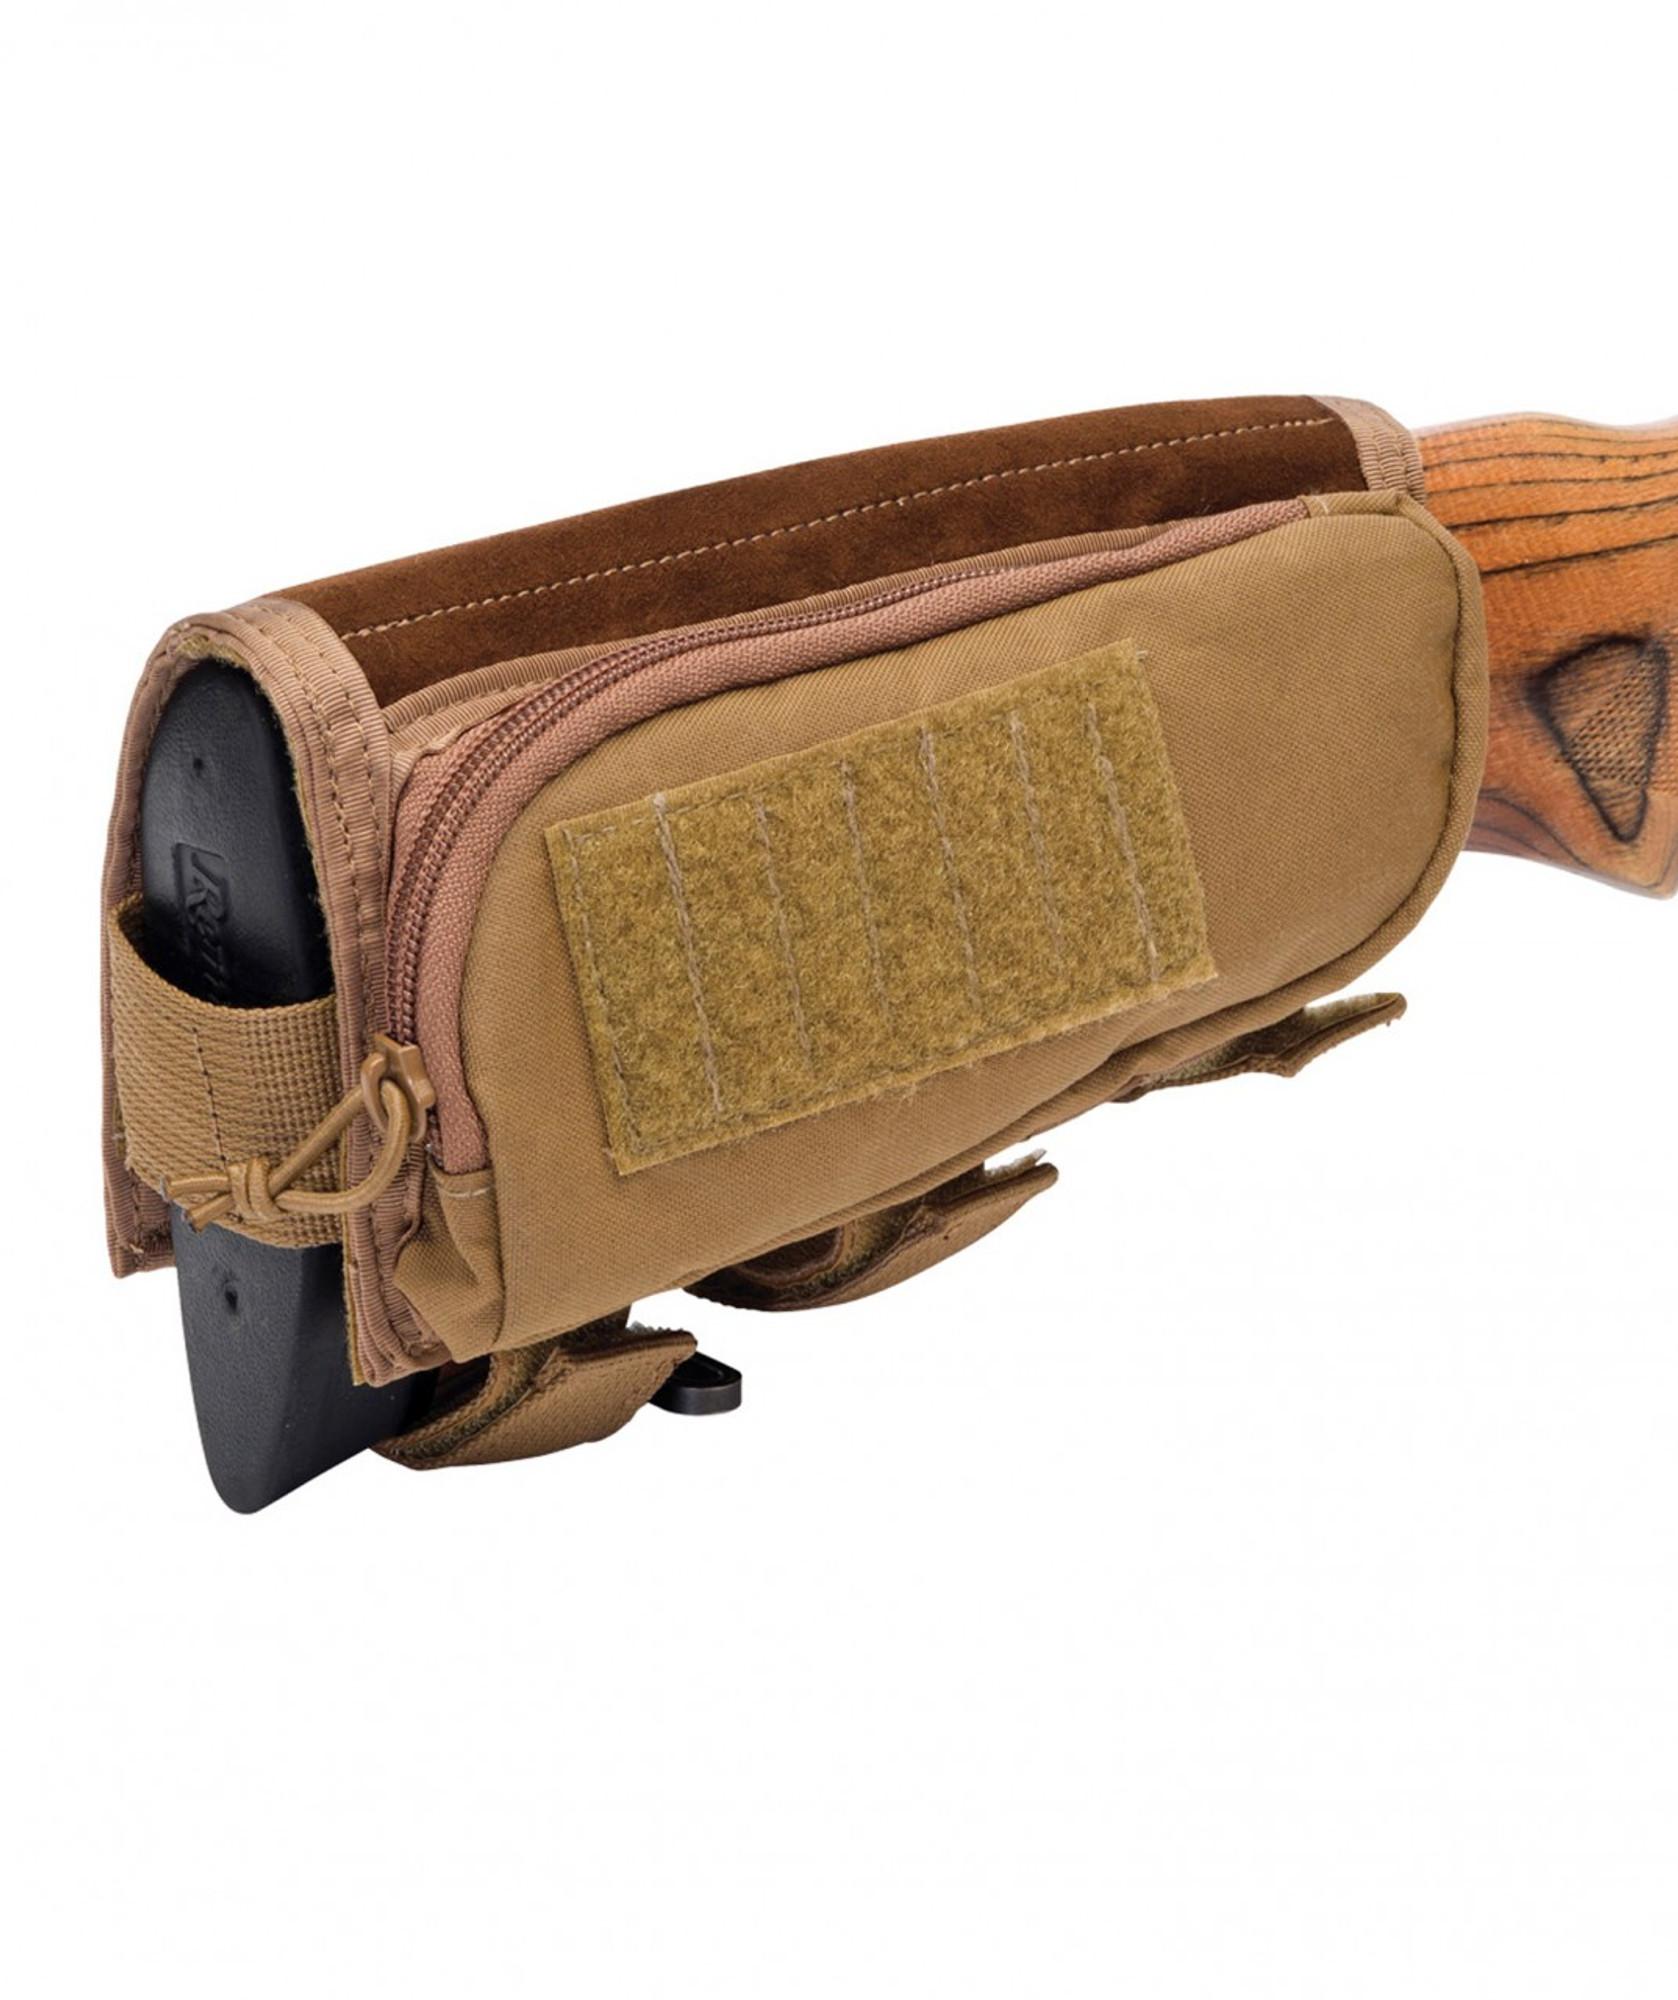 T3 Sniper Buttstock Cheek Rest T3 Gear